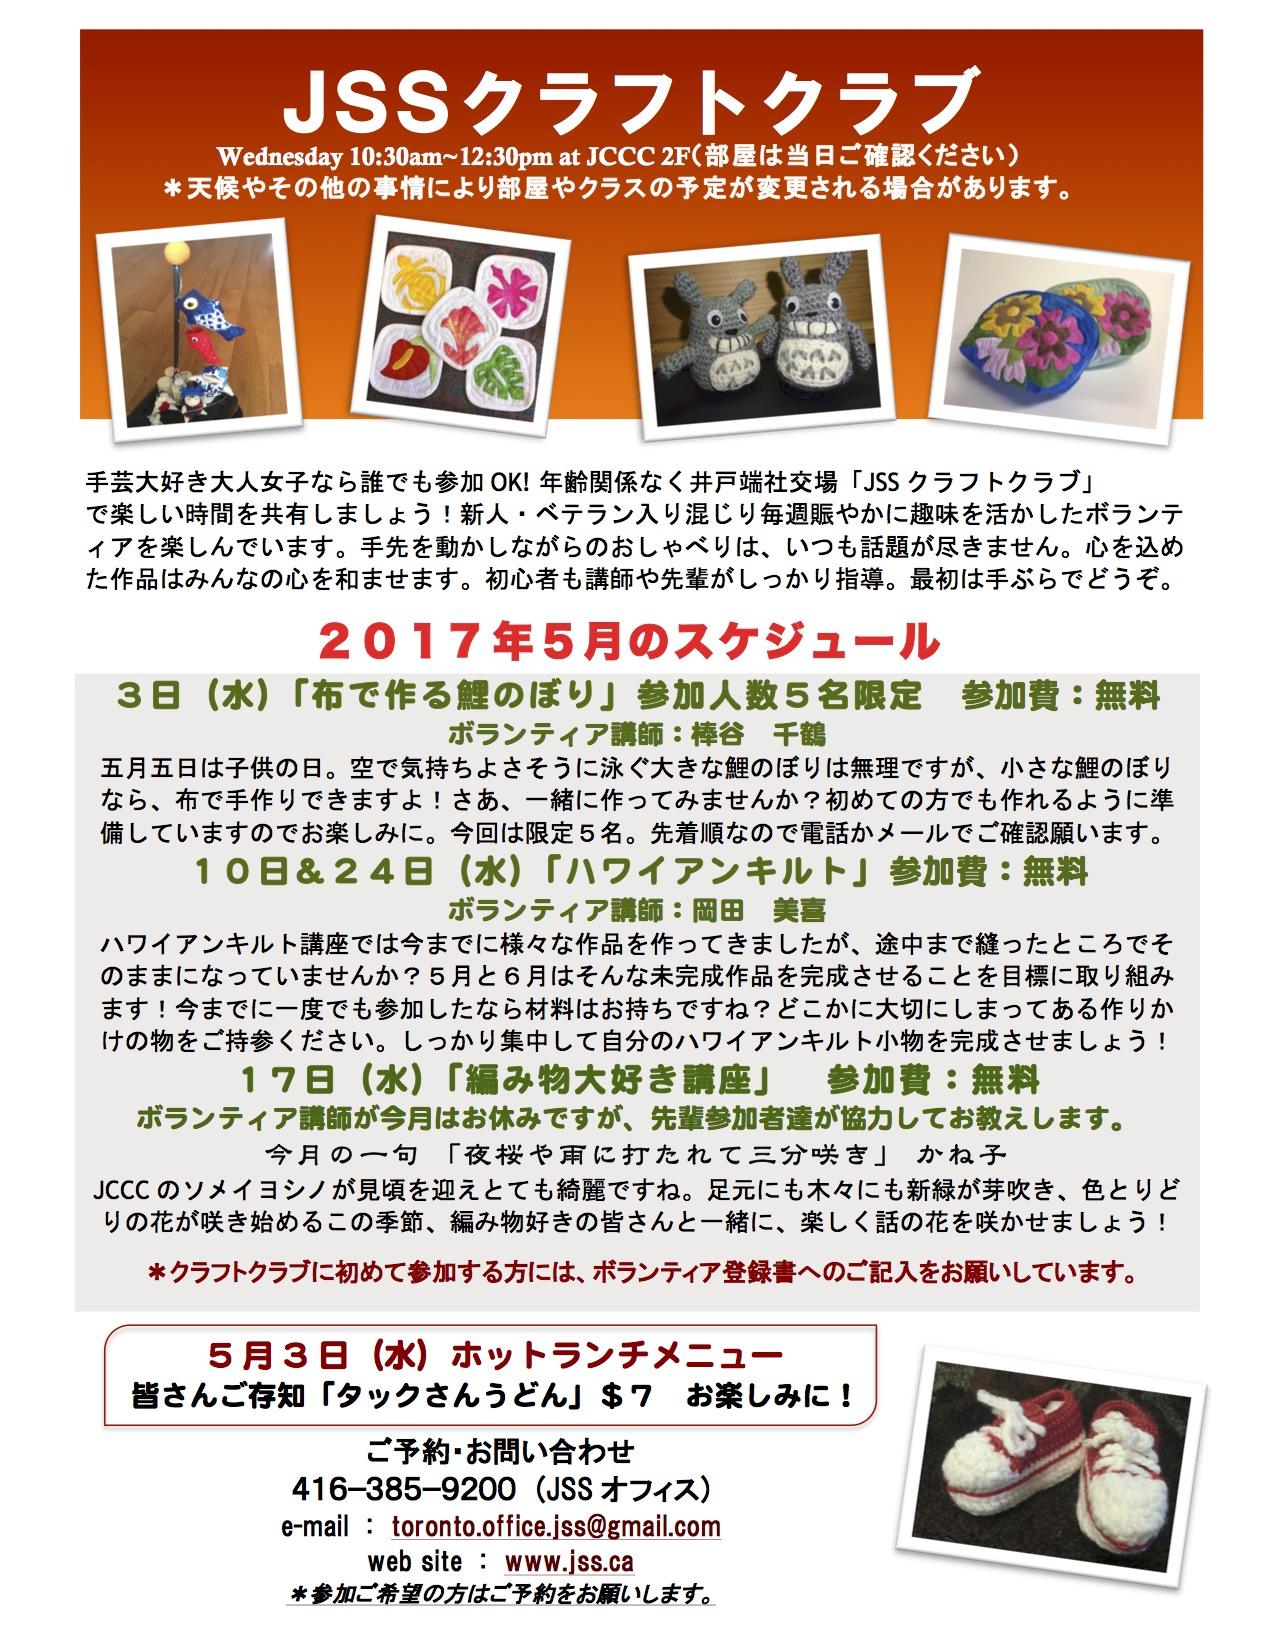 [:ja]JSS クラフトクラブ 5月の予定[:en]JSS Craft club May schedule[:]